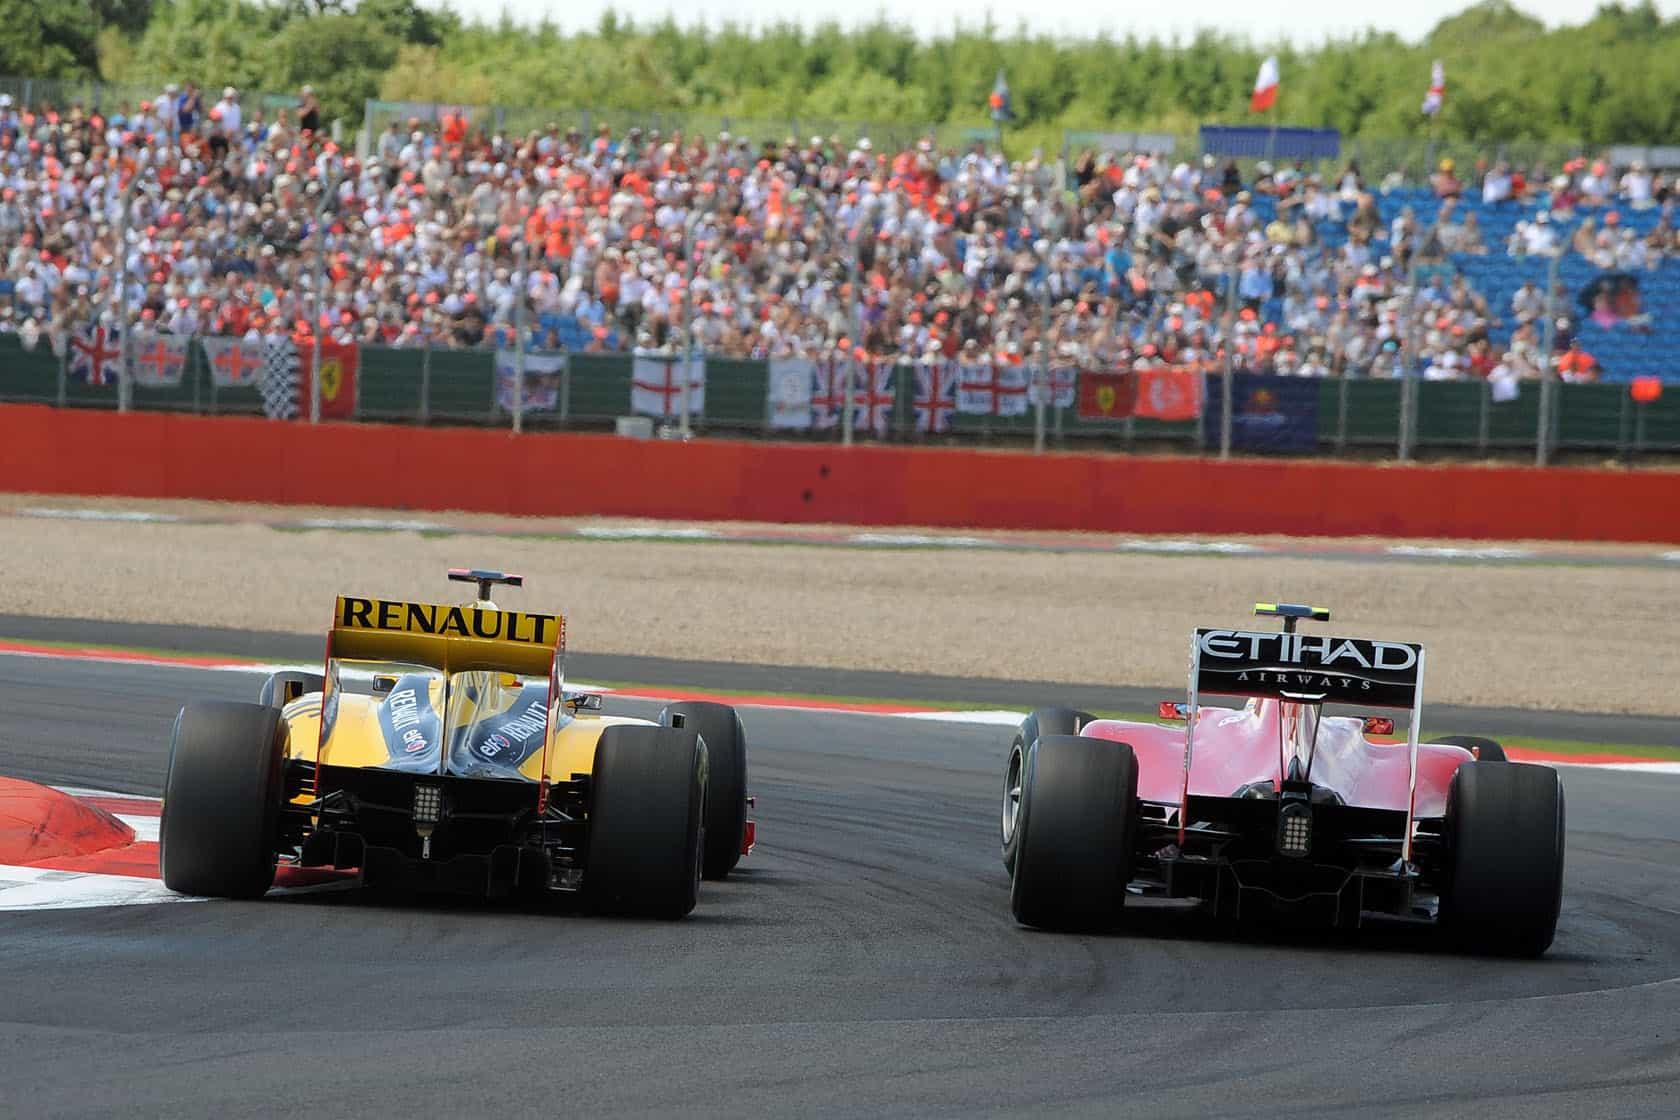 Alonso Kubica Silverstone British GP F1 2010 duel 2 Photo G-Force